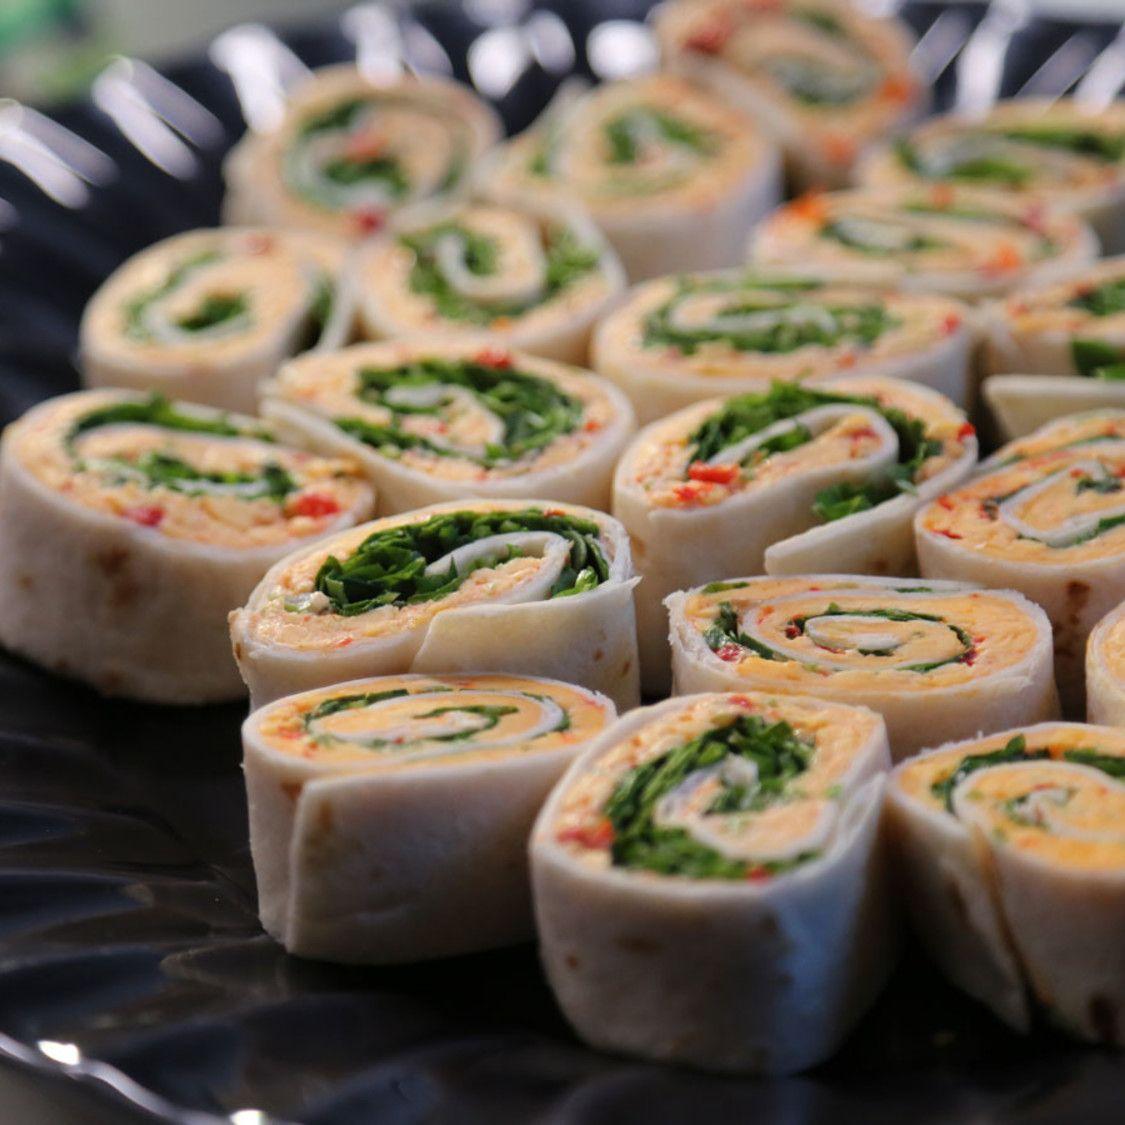 Pimiento Cheese Pinwheels Recipe In 2020 Food Network Recipes Pinwheels Cheese Pinwheels